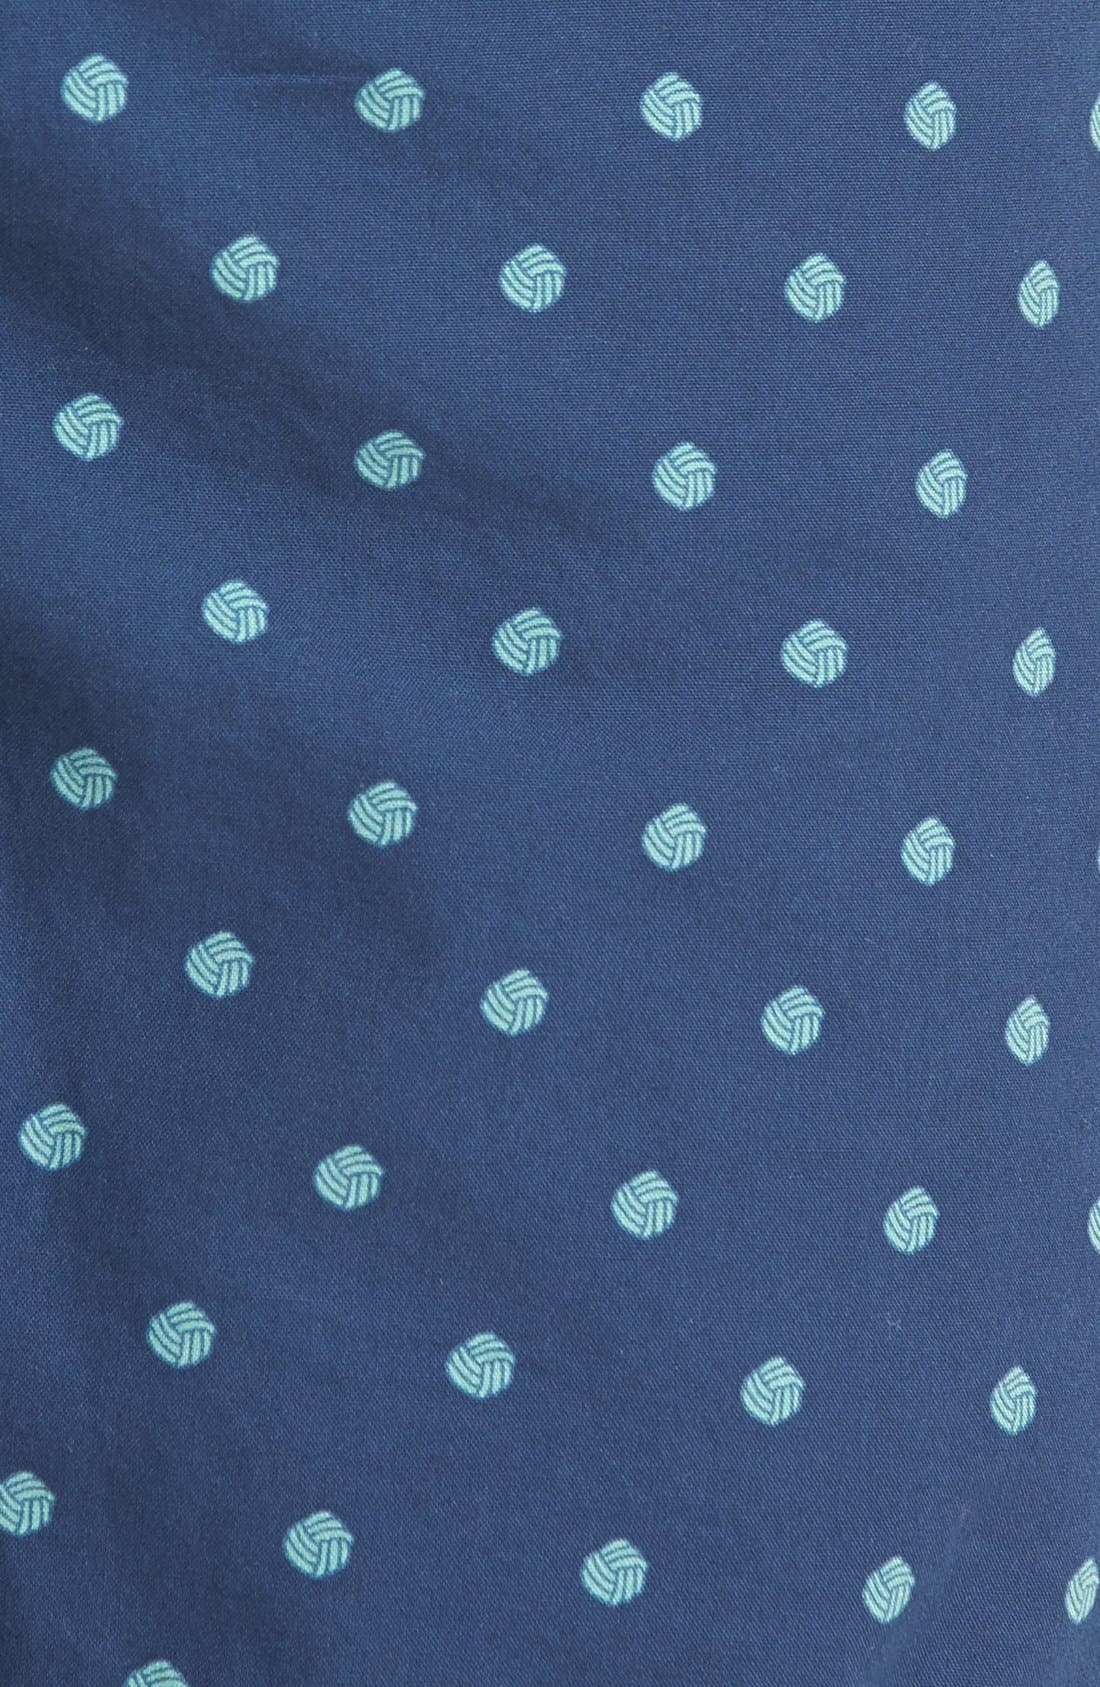 Alternate Image 3  - Dockers® 'Tie Knot' Print Shorts